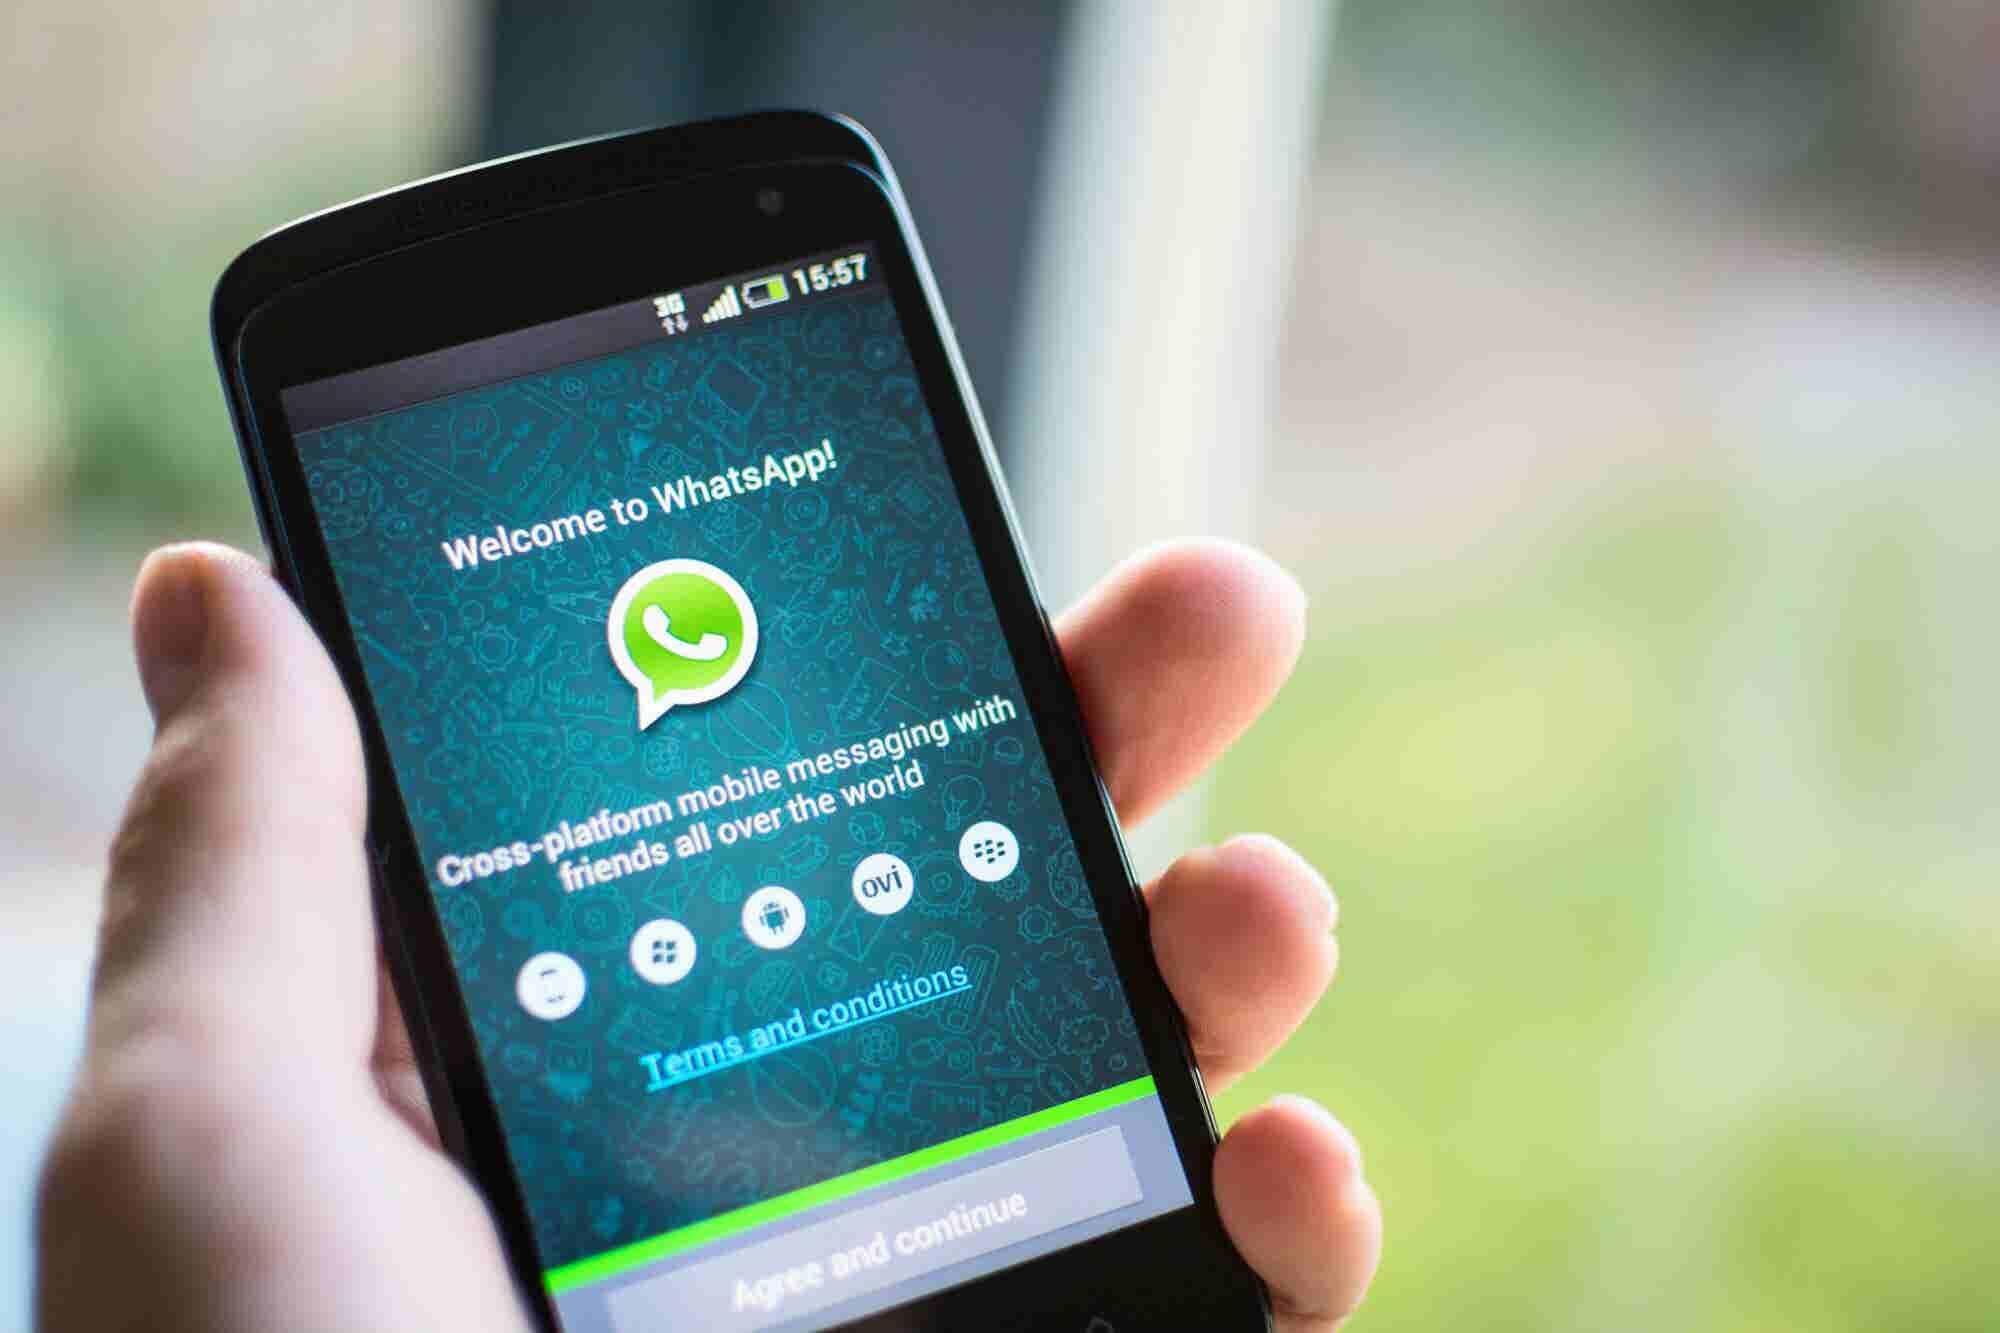 Ya podrás usar Whatsapp para atender mejor a tus clientes. Te decimos...